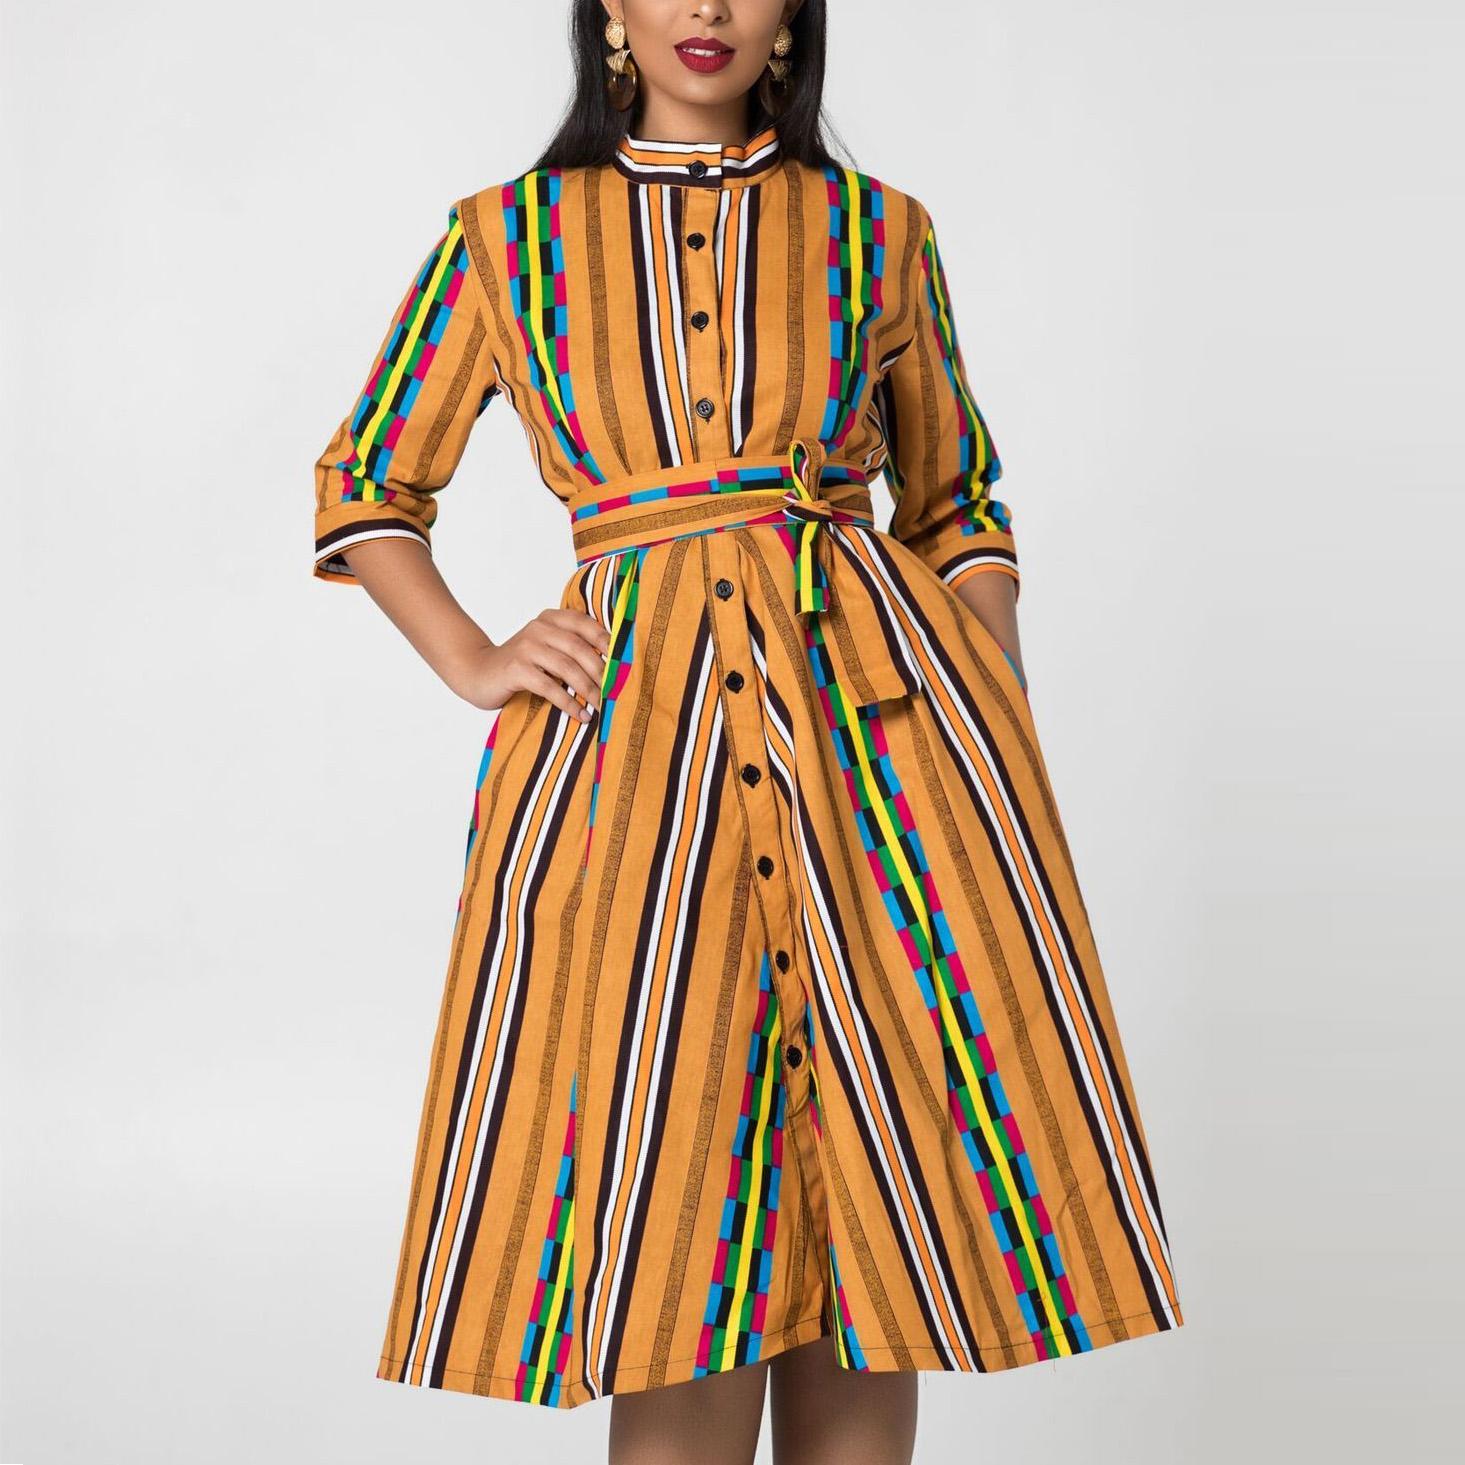 African Clothing Ladies Fancy Vertical Stripe Print Kitenge Dress Fashion Designs China Garment Factory Buy African Fancy Dress African Clothing Dresses African Kitenge Dress Designs Product On Alibaba Com